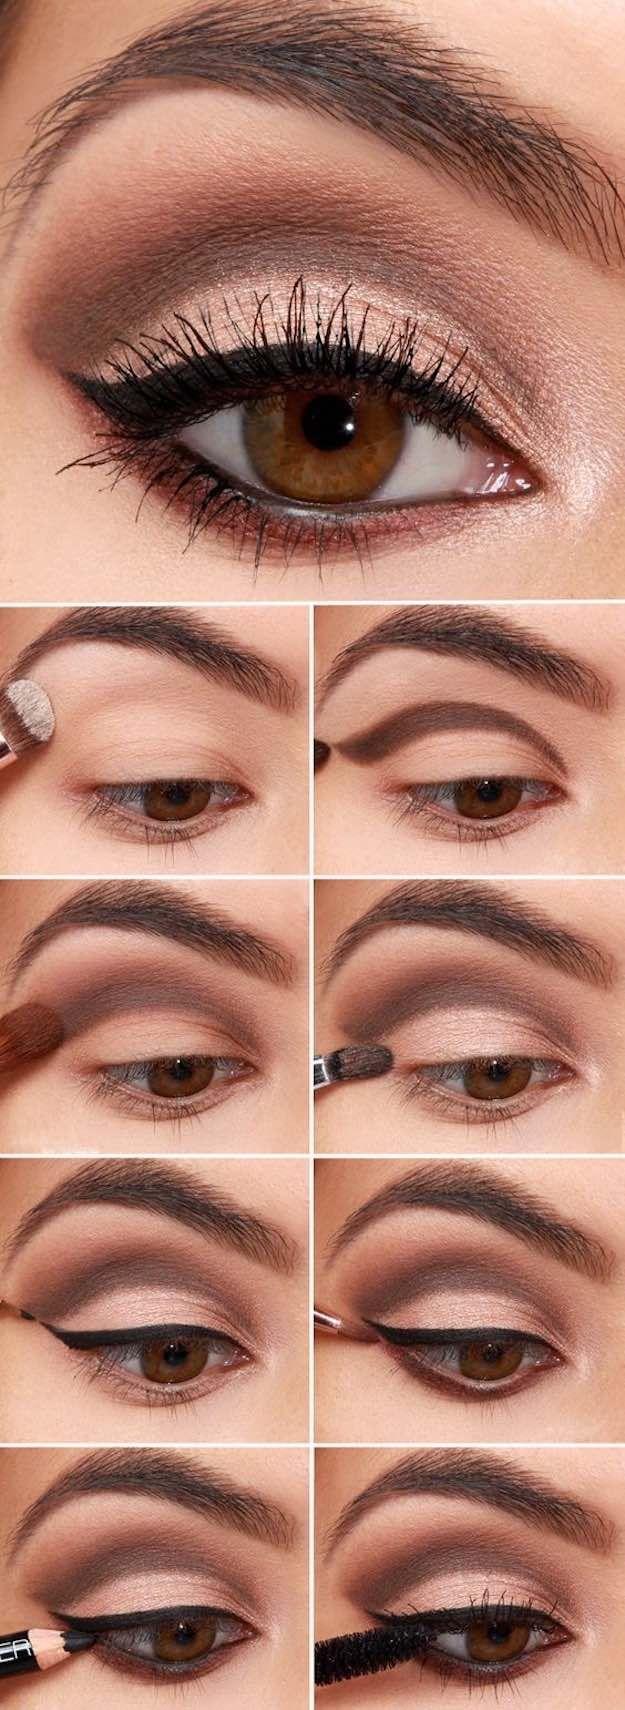 30 Wedding Makeup Ideas for Brides | Wedding makeup, Brown eyes and ...